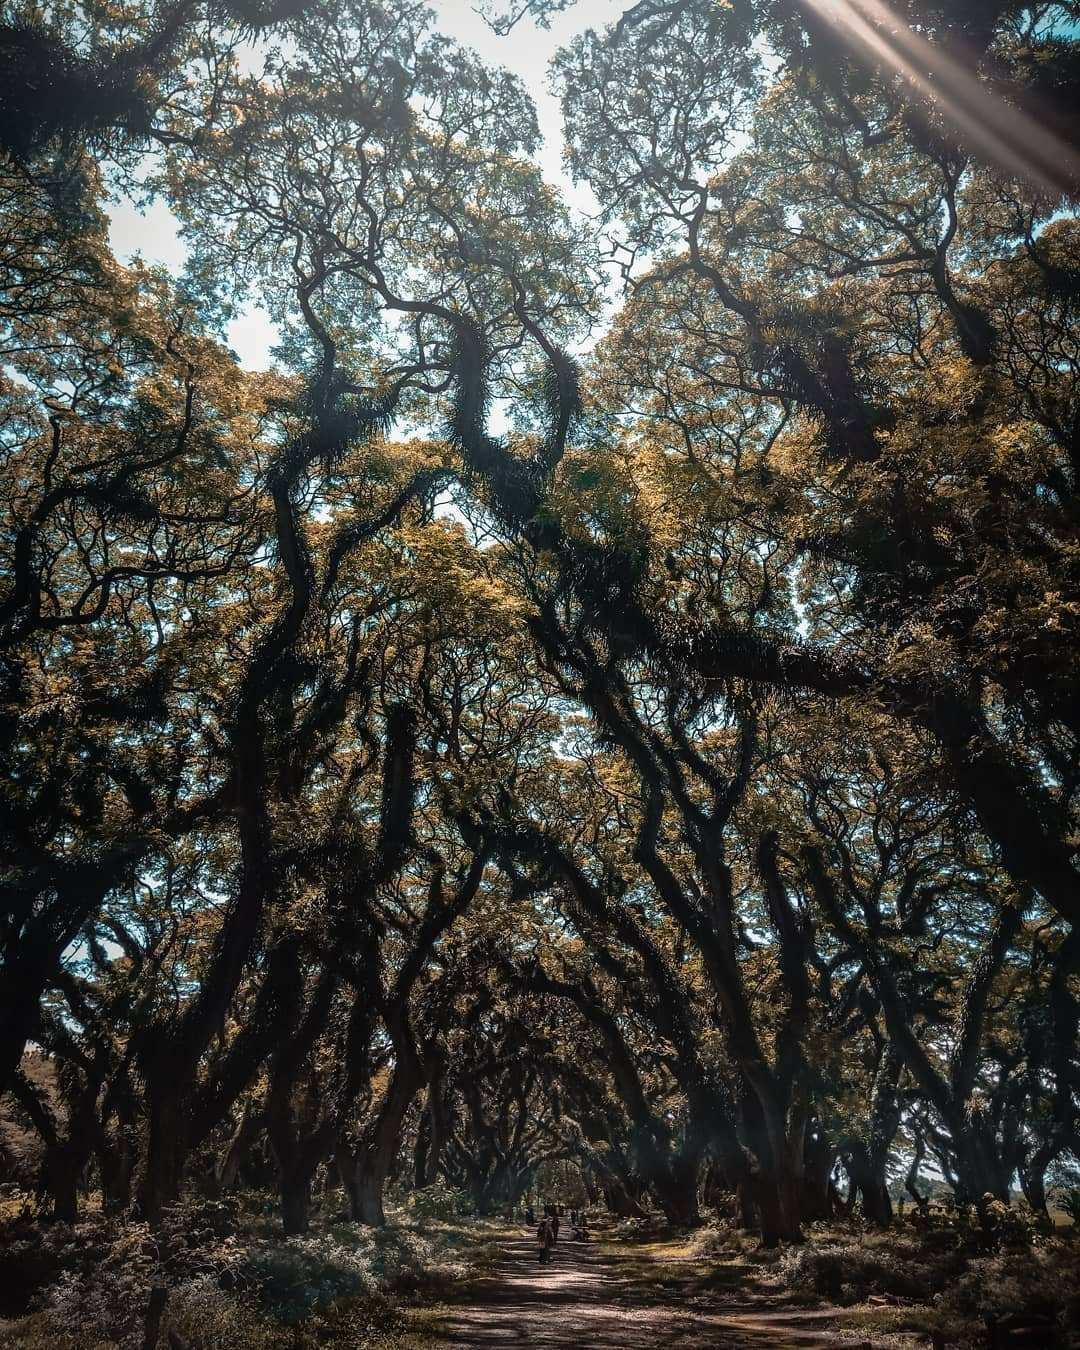 Rimbunnya Pohon Trembes di De Djawatan, Images From @muchamadsyamsudin